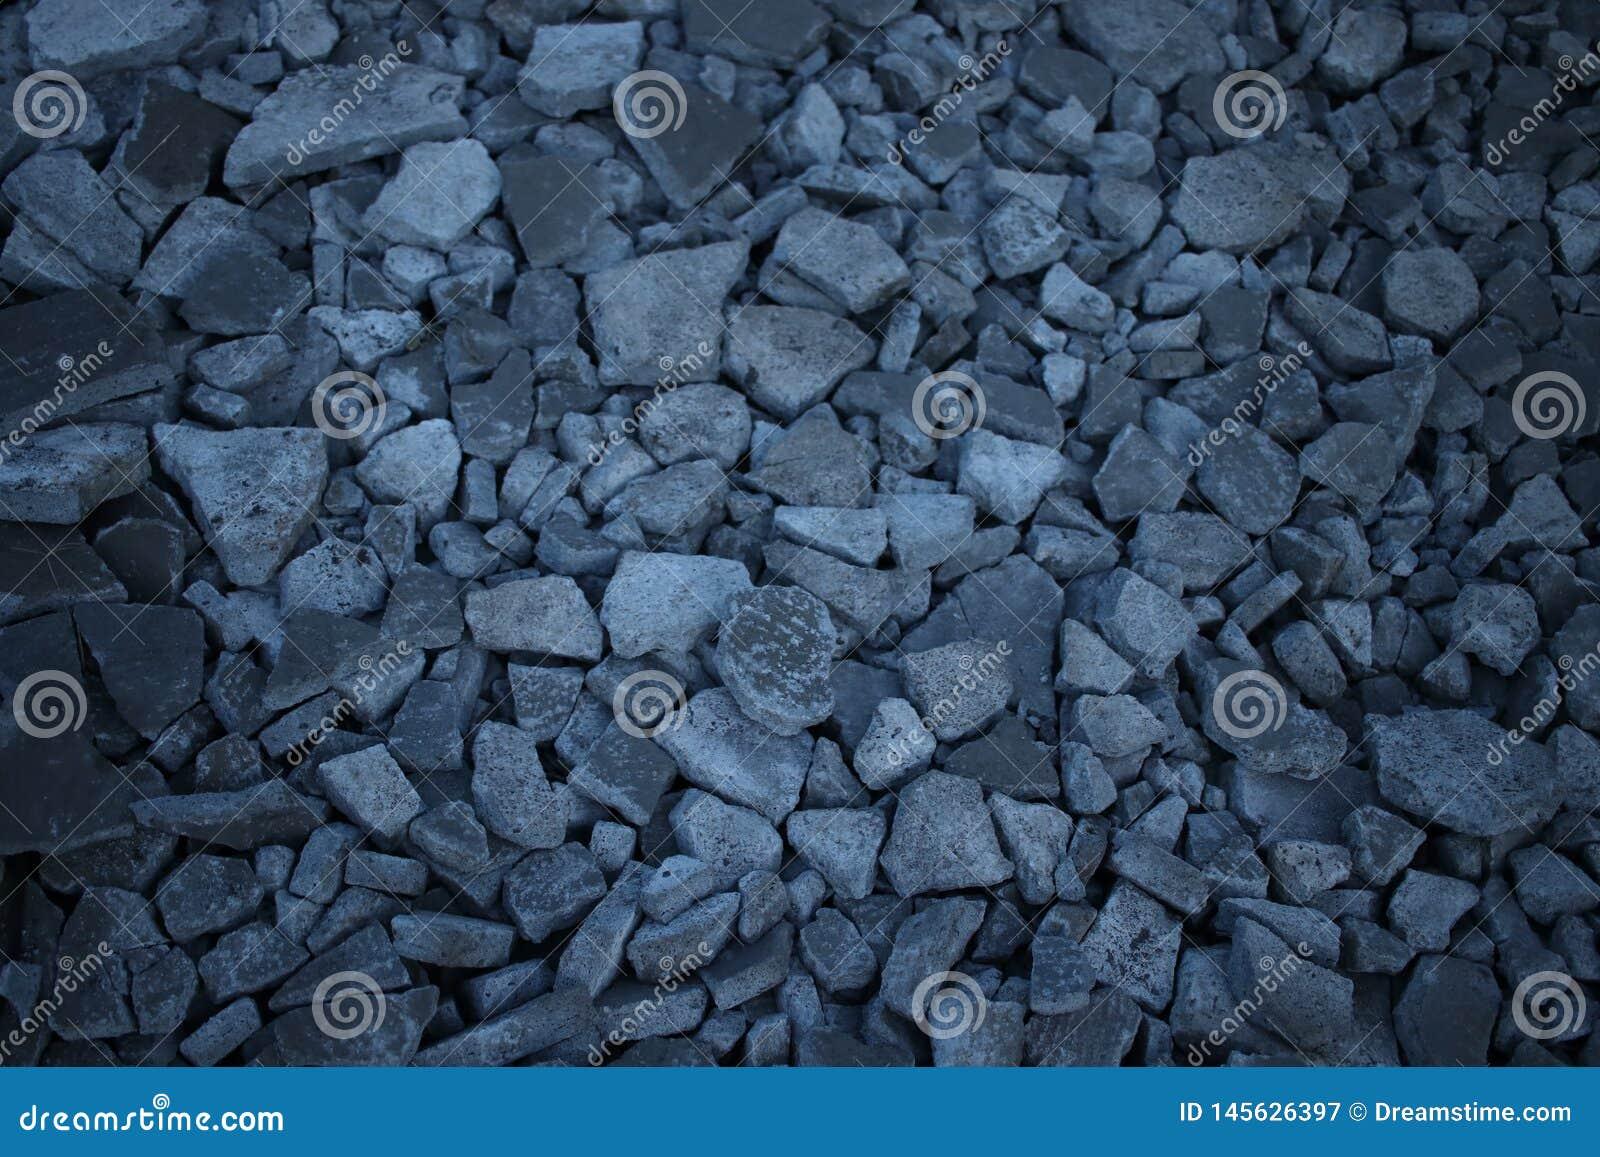 Broken stone and mortar